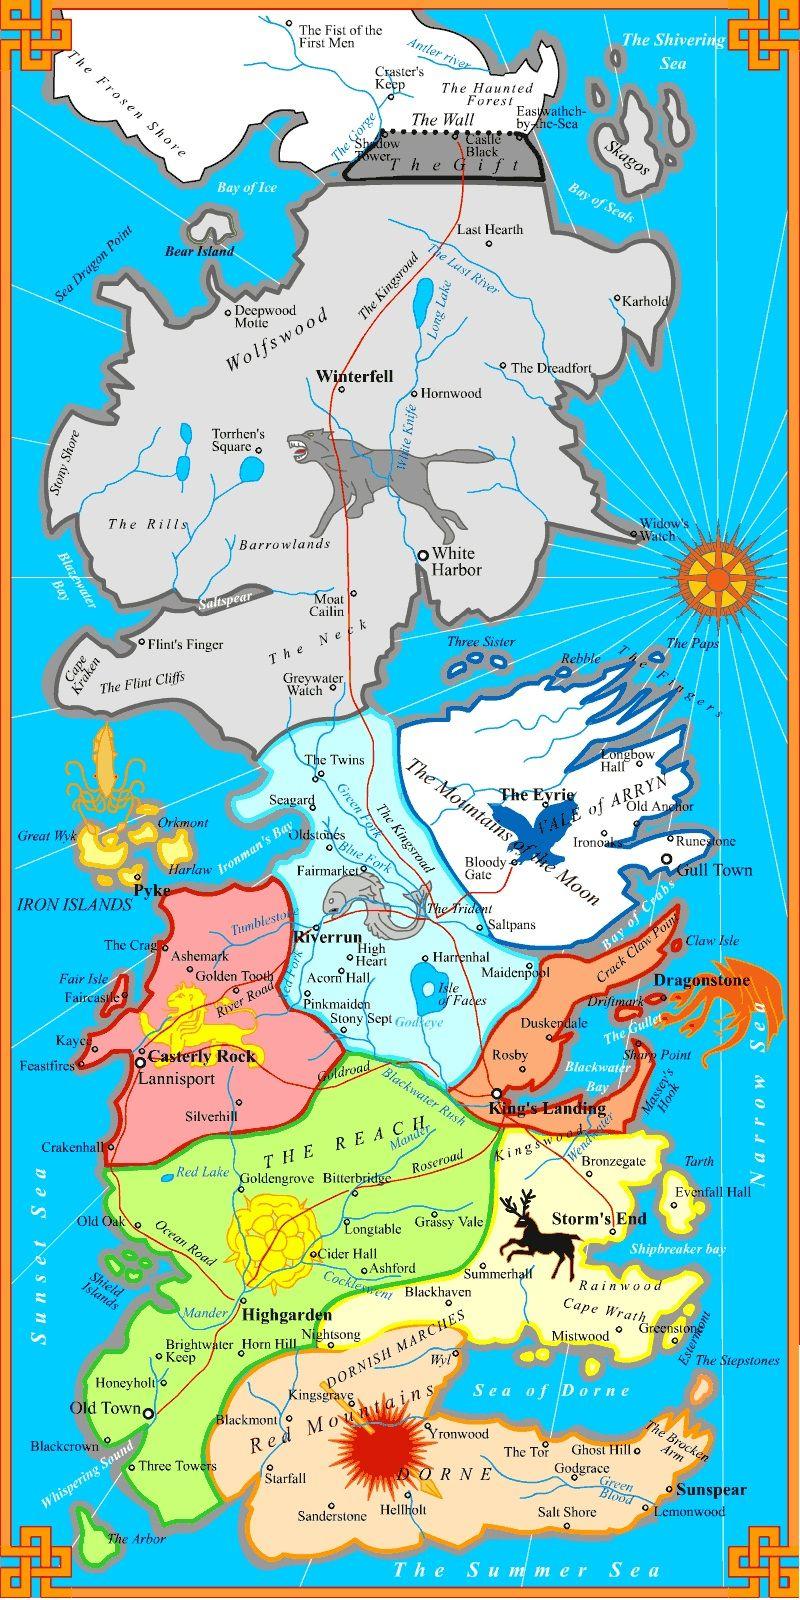 Map Westeros High Garden | House Targaryen - Have no true home but ...